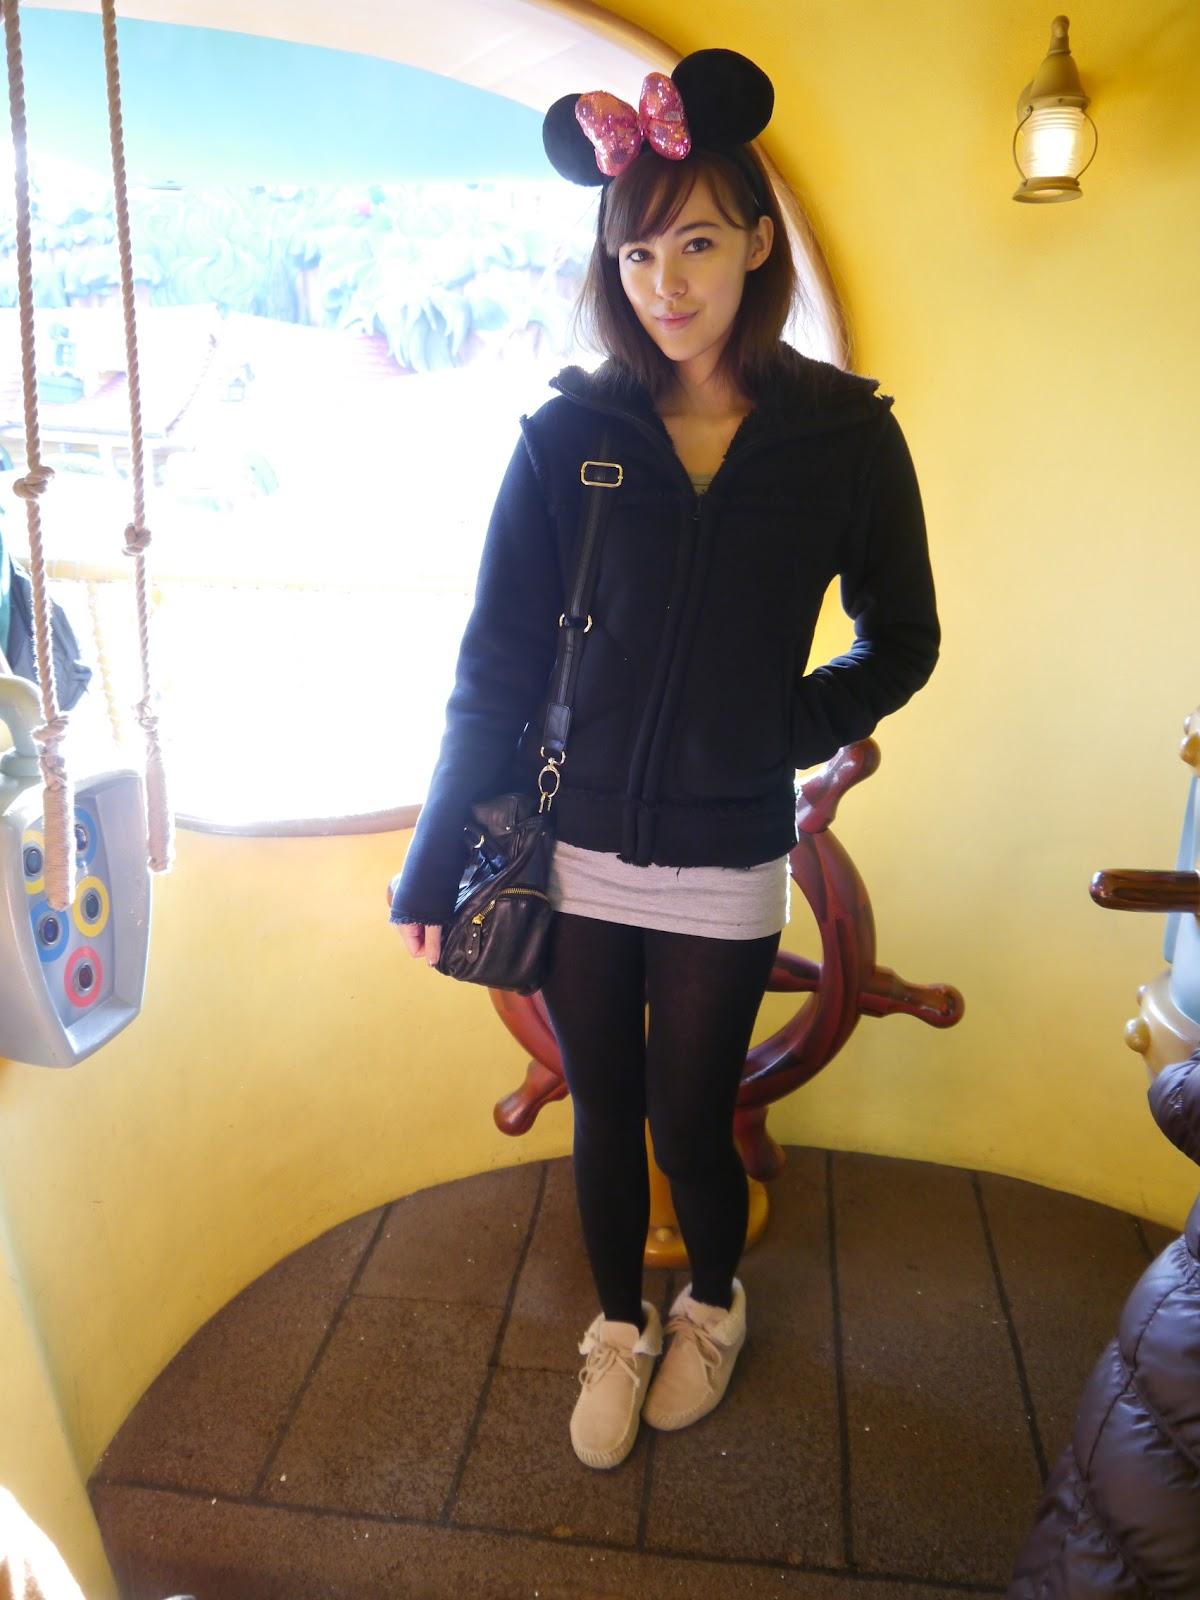 Tokyo (4) - Disneyland